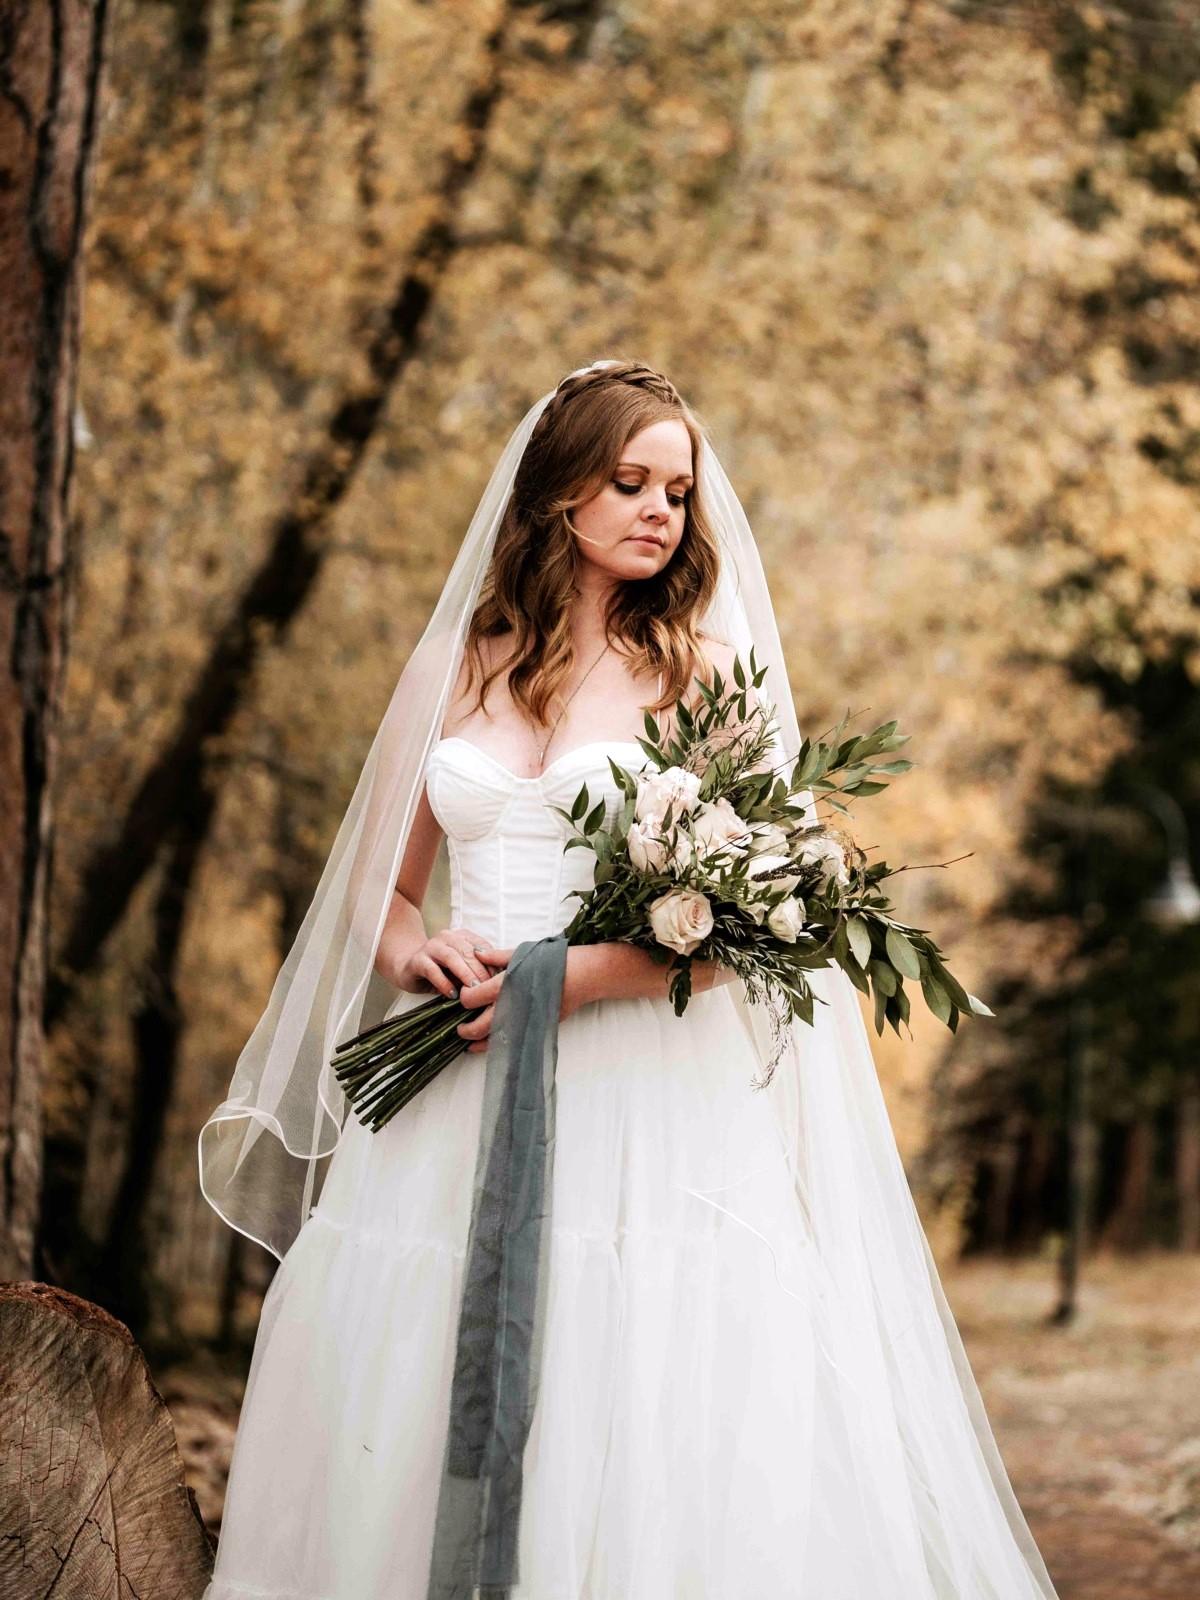 Nancy Rice Artistry - Lake Tahoe wedding hair & makeup - bride holding bouquet